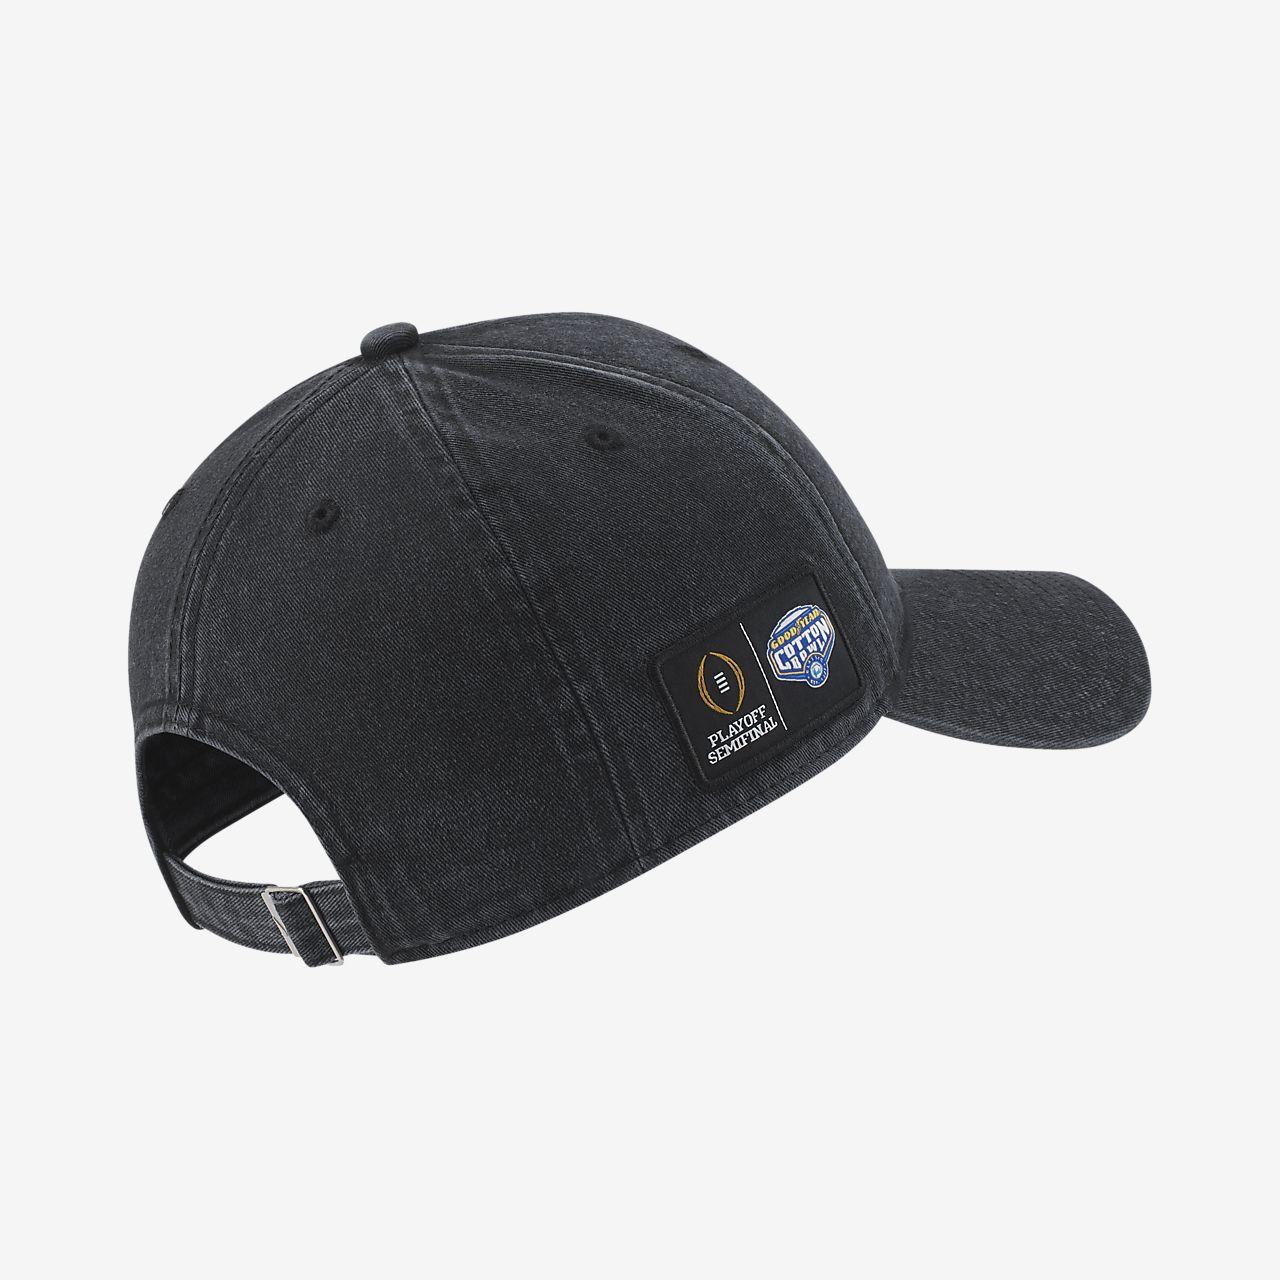 df99aa8631a7f Nike College Playoff Bound Legacy91 (Clemson) Hat. Nike.com